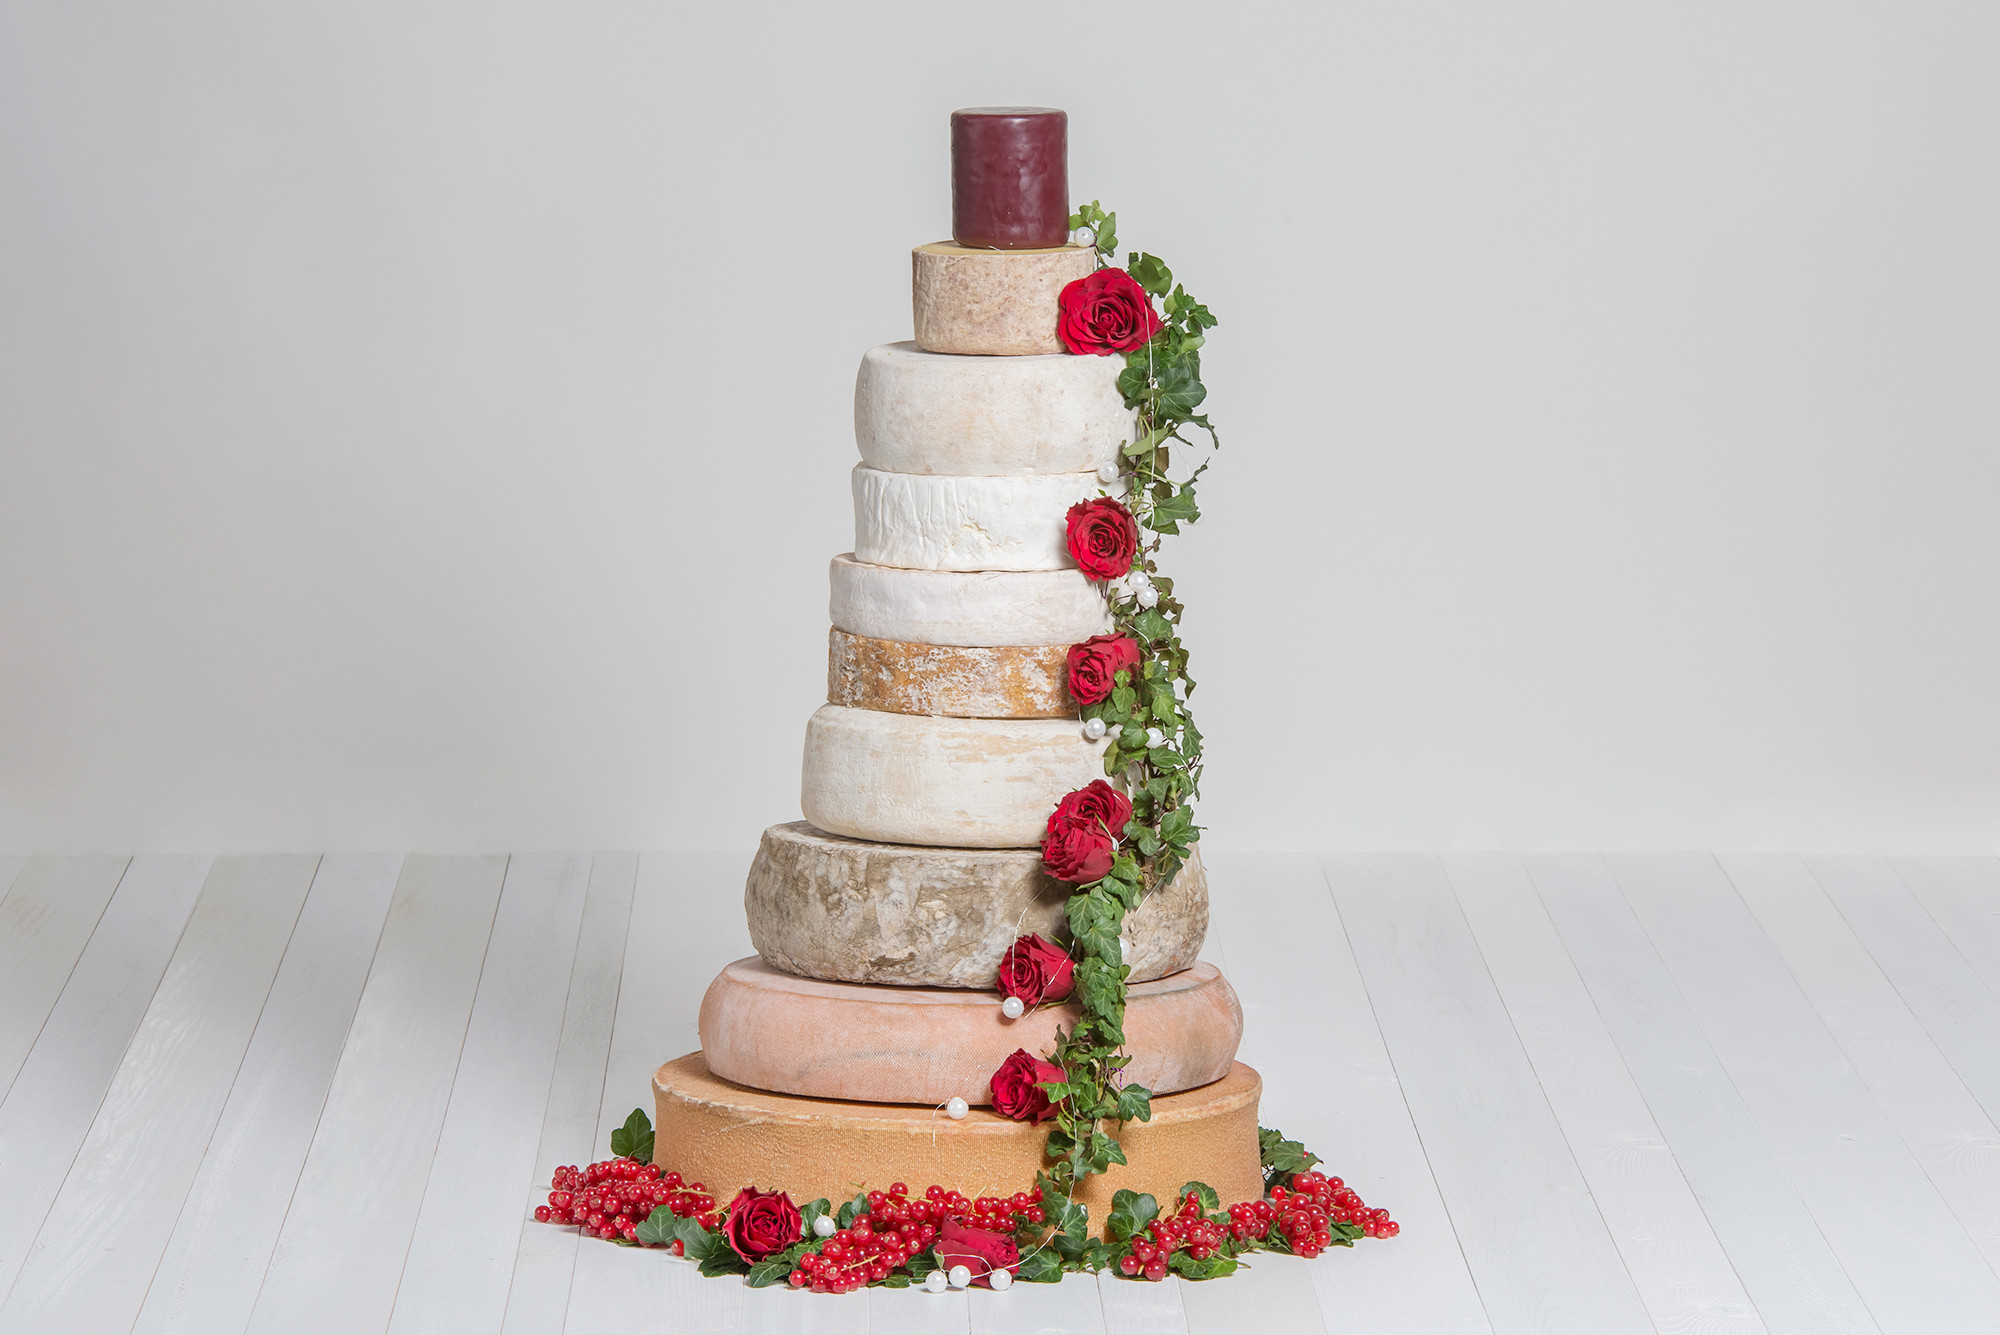 Maximiliane | Käse-Hochzeitstorte